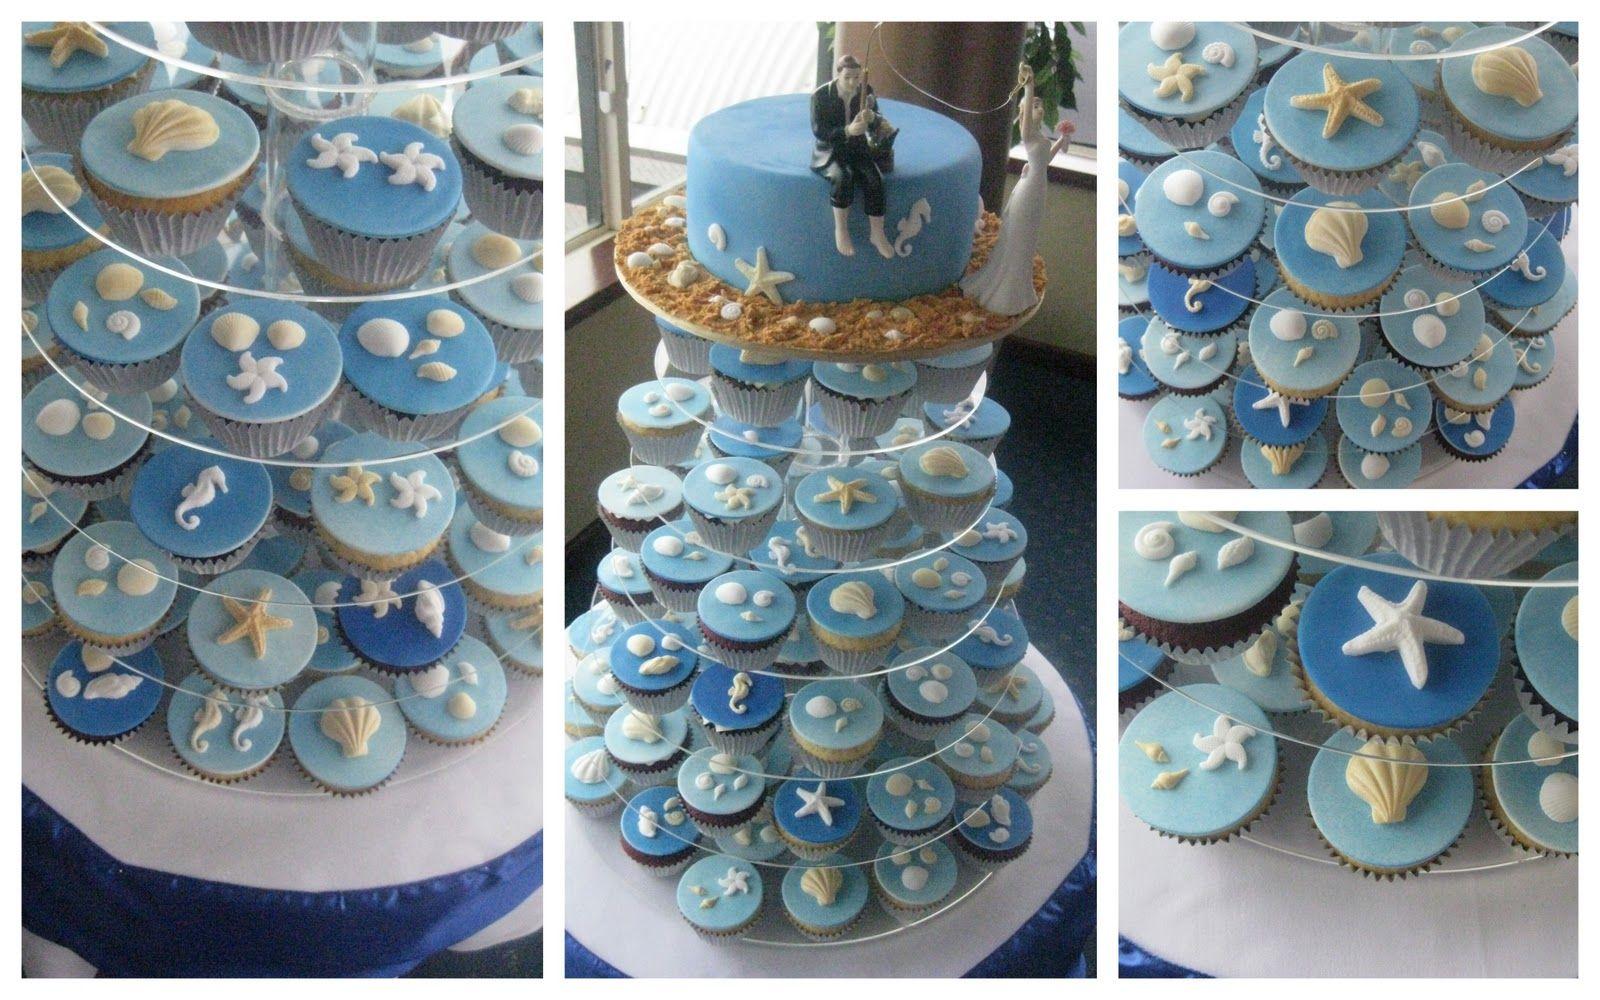 Pin By Sarah Villanueva On Wedding Ideas Pinterest Cupcake Tier